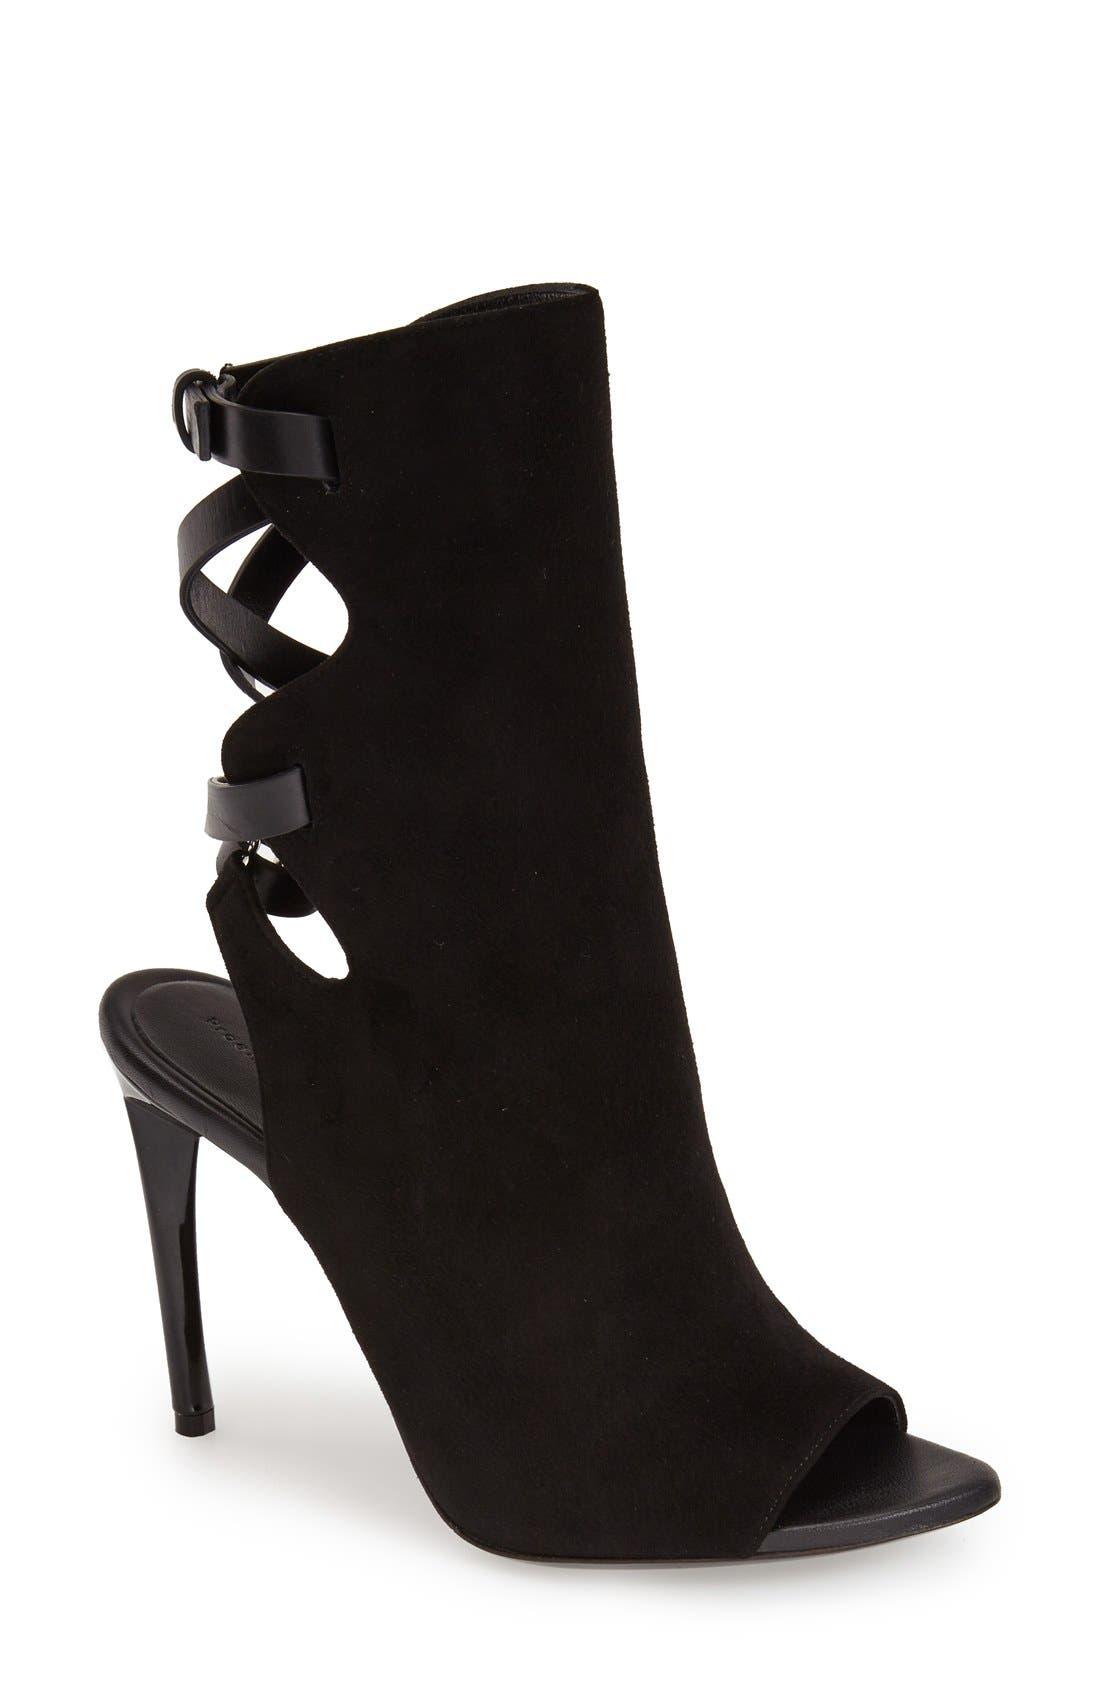 Alternate Image 1 Selected - Proenza Schouler 'Selvino' Peep Toe Boot (Women)